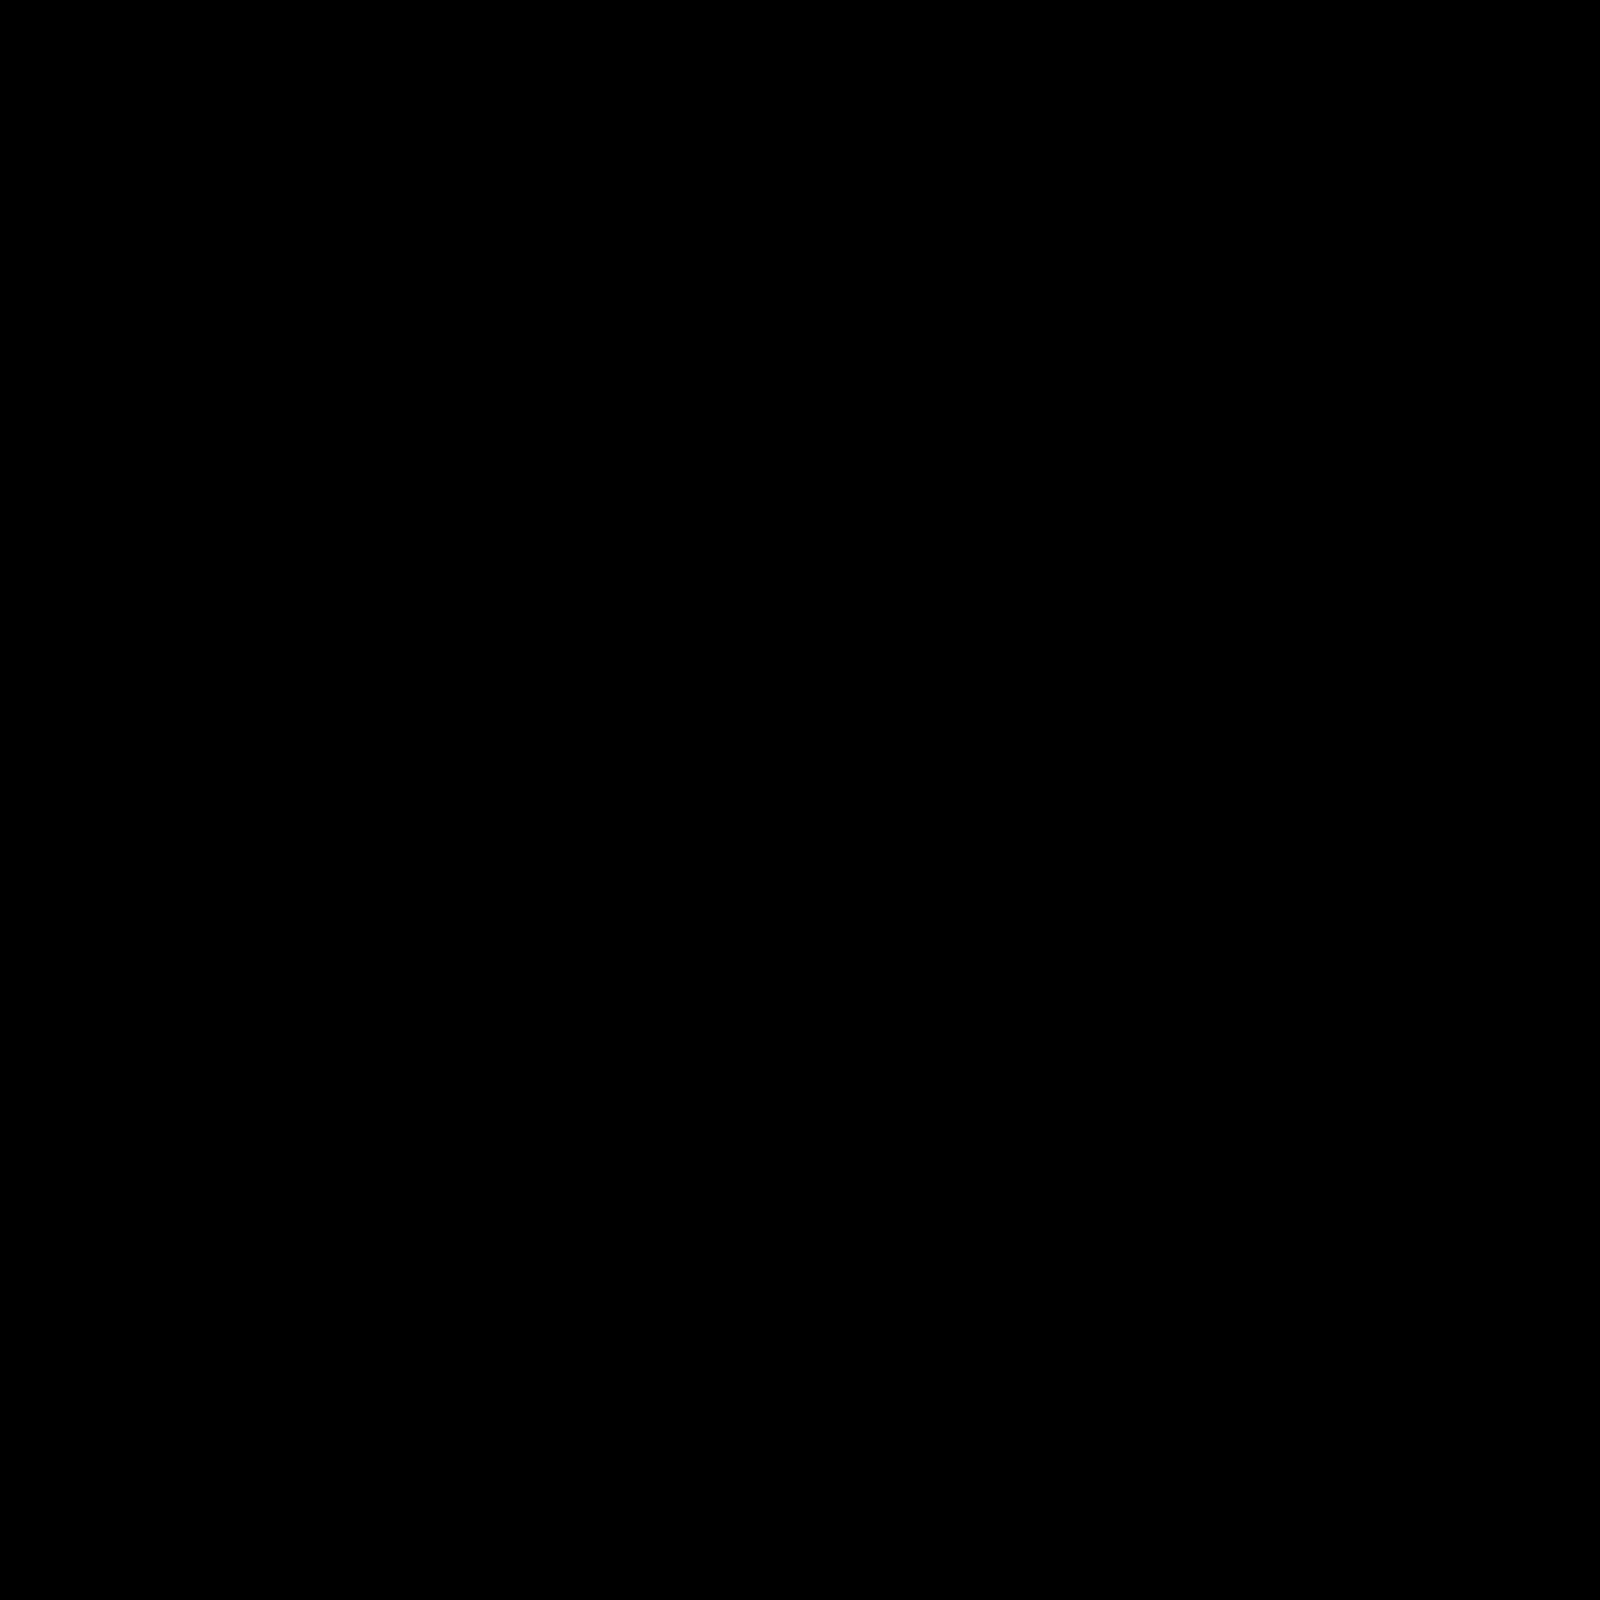 LinkedIn Circled Filled icon